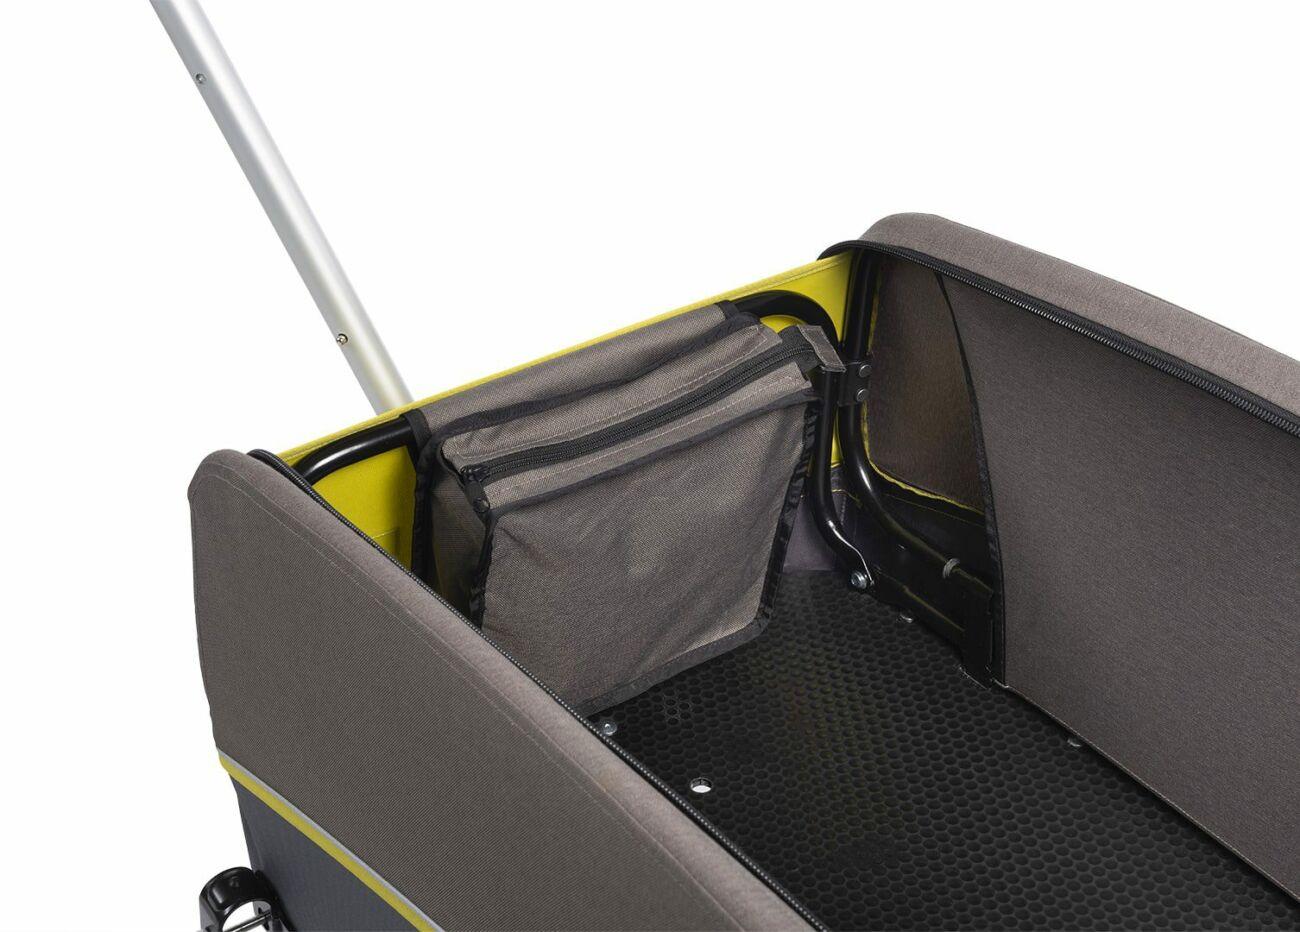 121008120 Croozer Cargo Kalle Bollerwagen 02 Lemon Green 2020 Web